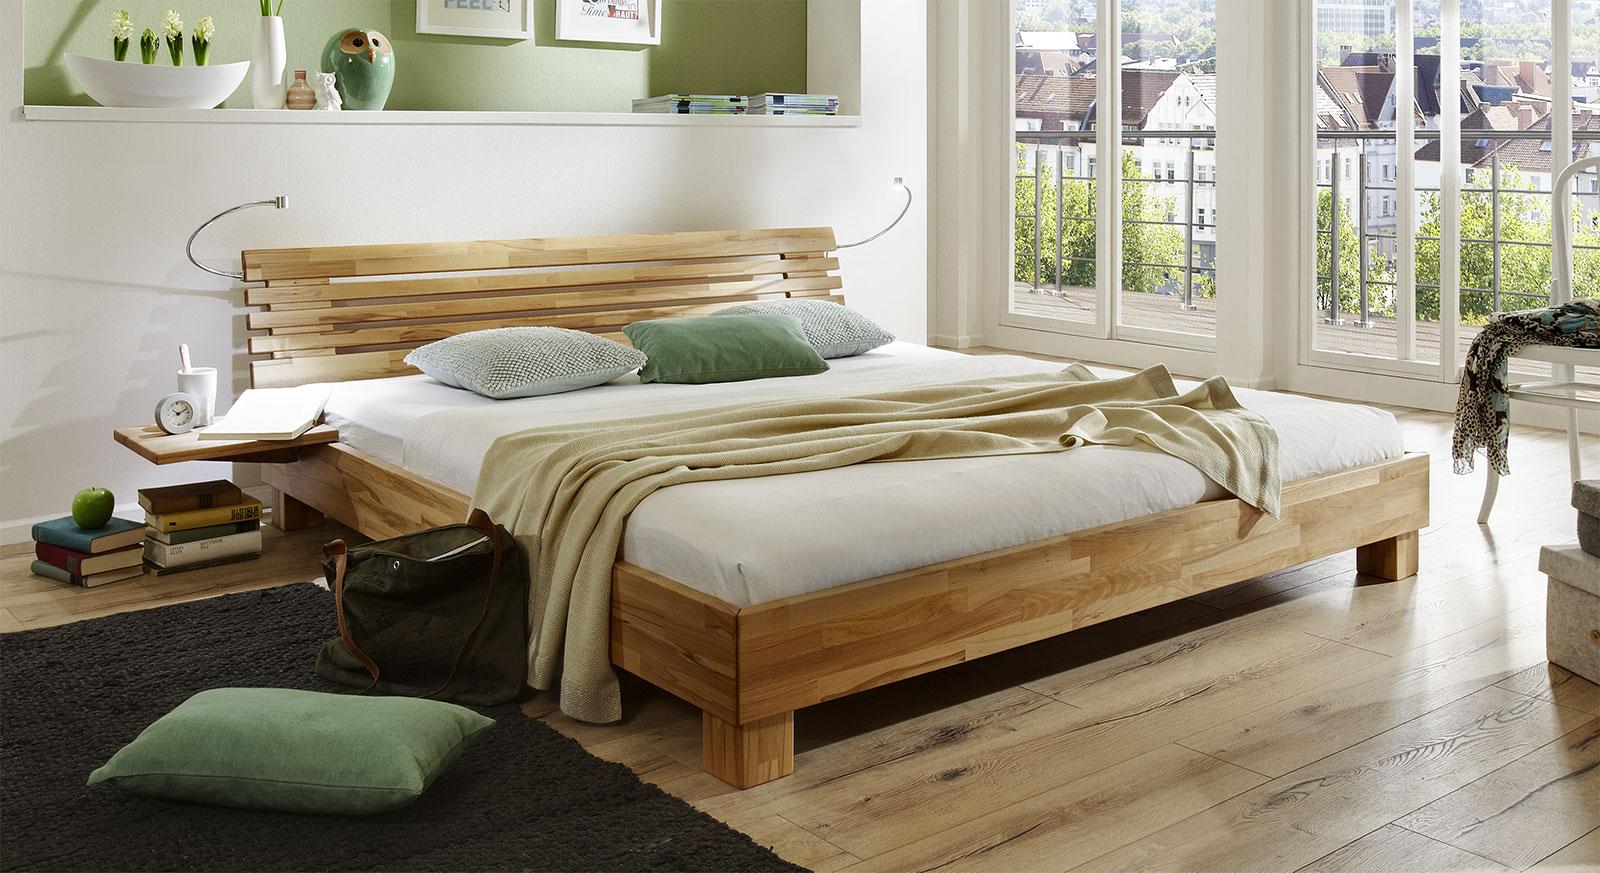 Bett Marmore aus Massivholz in Kernbuche natur